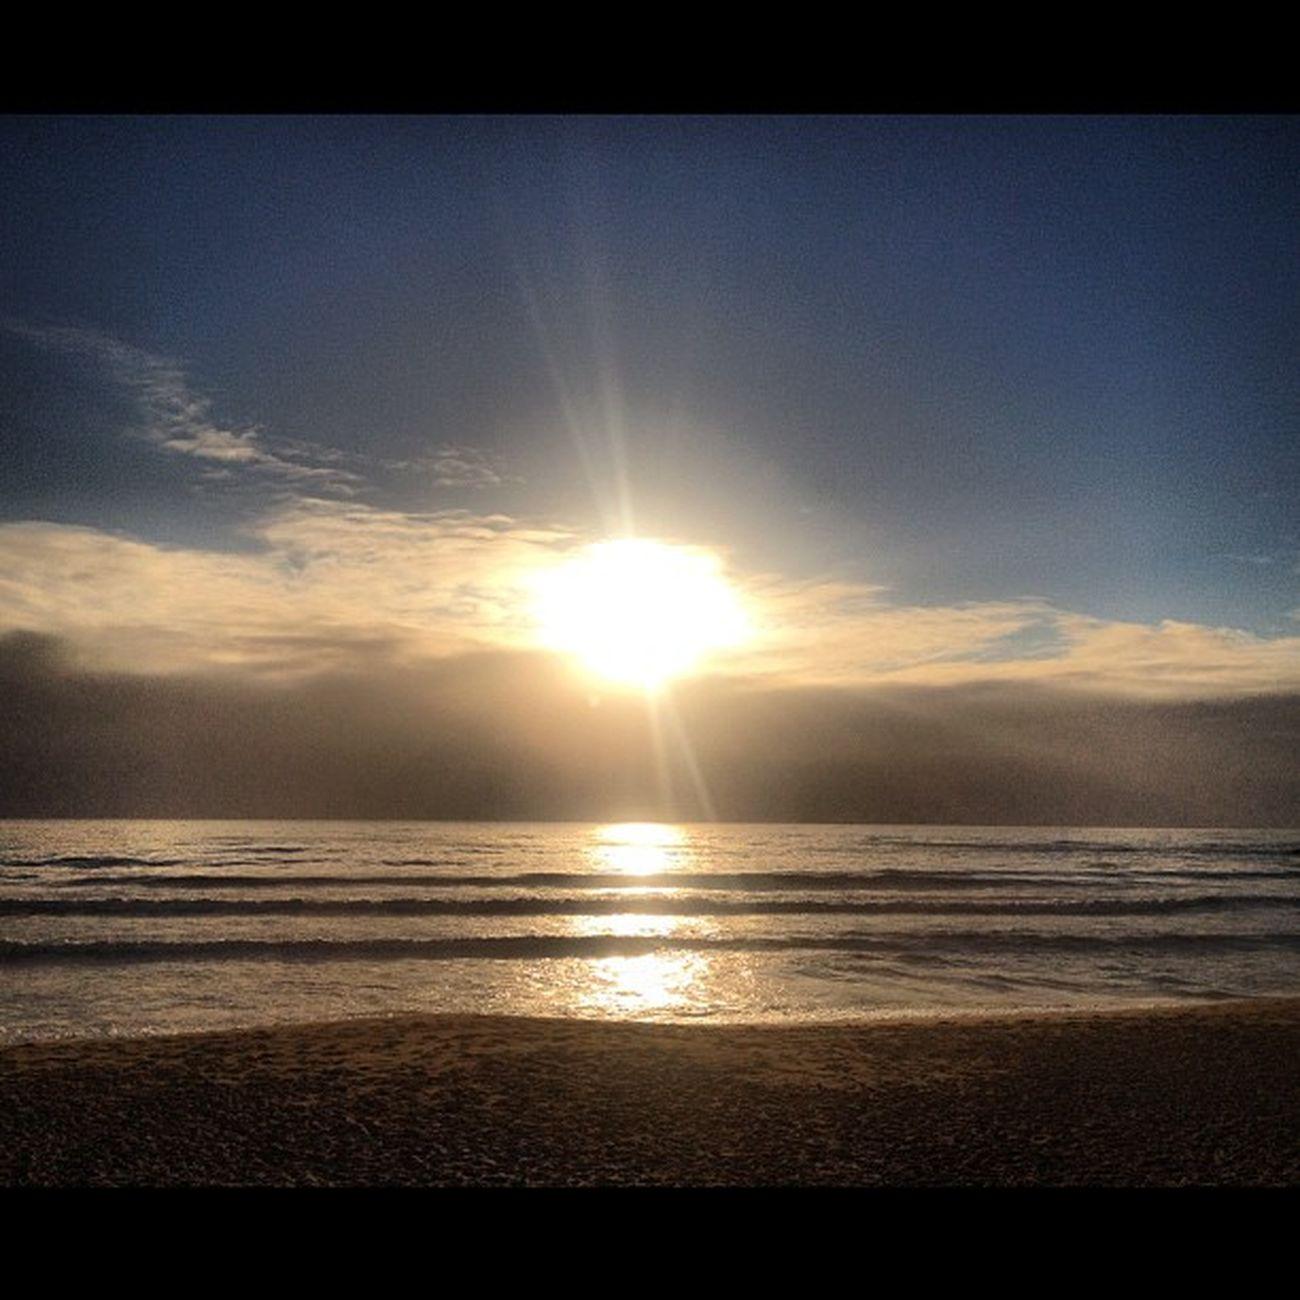 #espinho #beach #summer #iphone4s #instagood #instagram #instalove #iphonesia #instamania #photooftheday Instagood Instamania Instalove Igers_porto Igers_porto_sunset Espinho Summer Beach IPhone4s Photooftheday Iphonesia Instagram